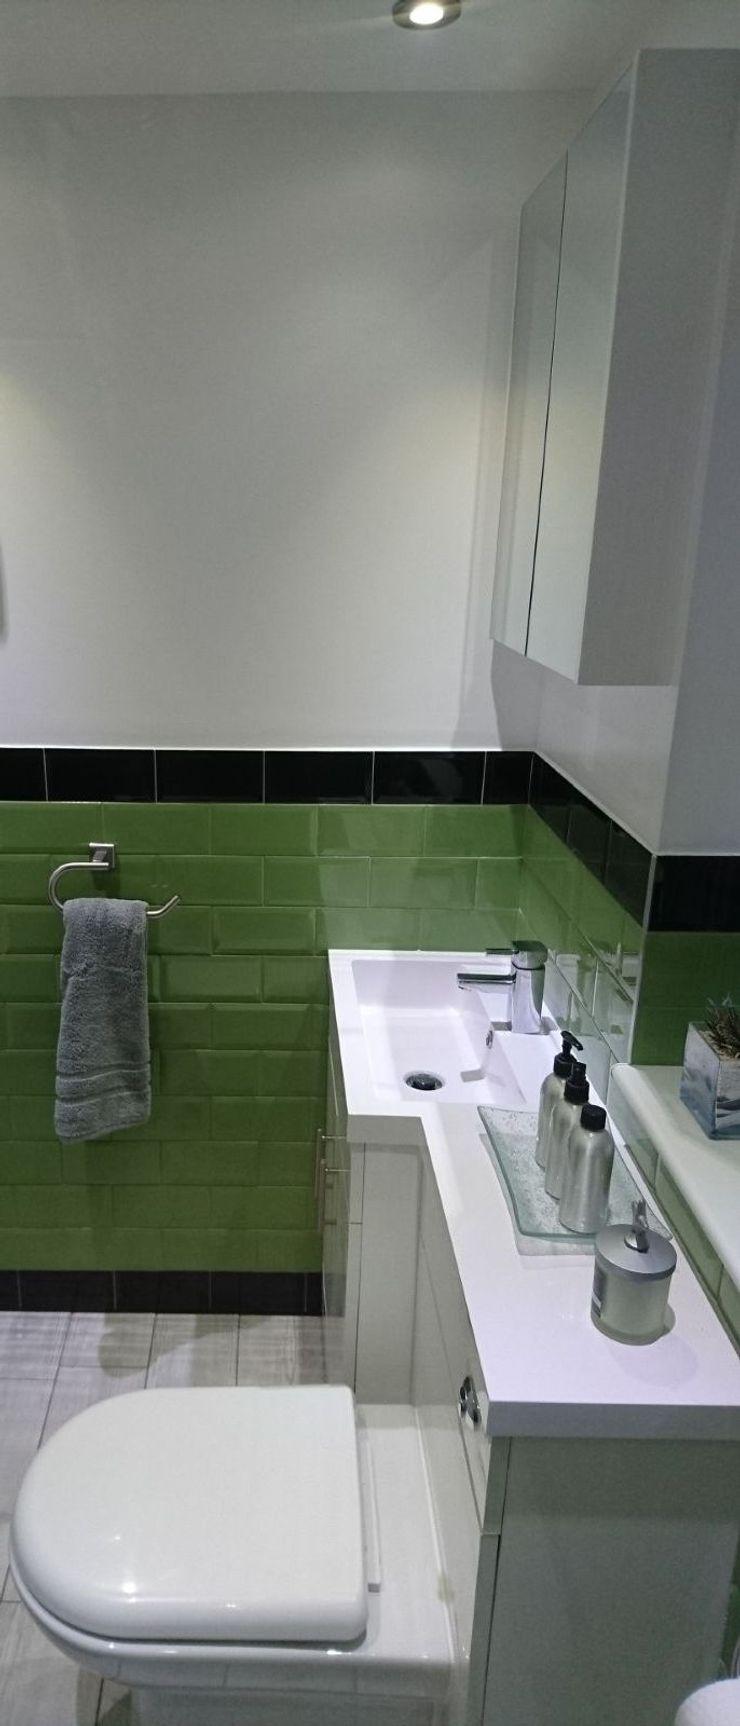 Bathroom Refurbishment and Re-design Kerry Holden Interiors Modern bathroom